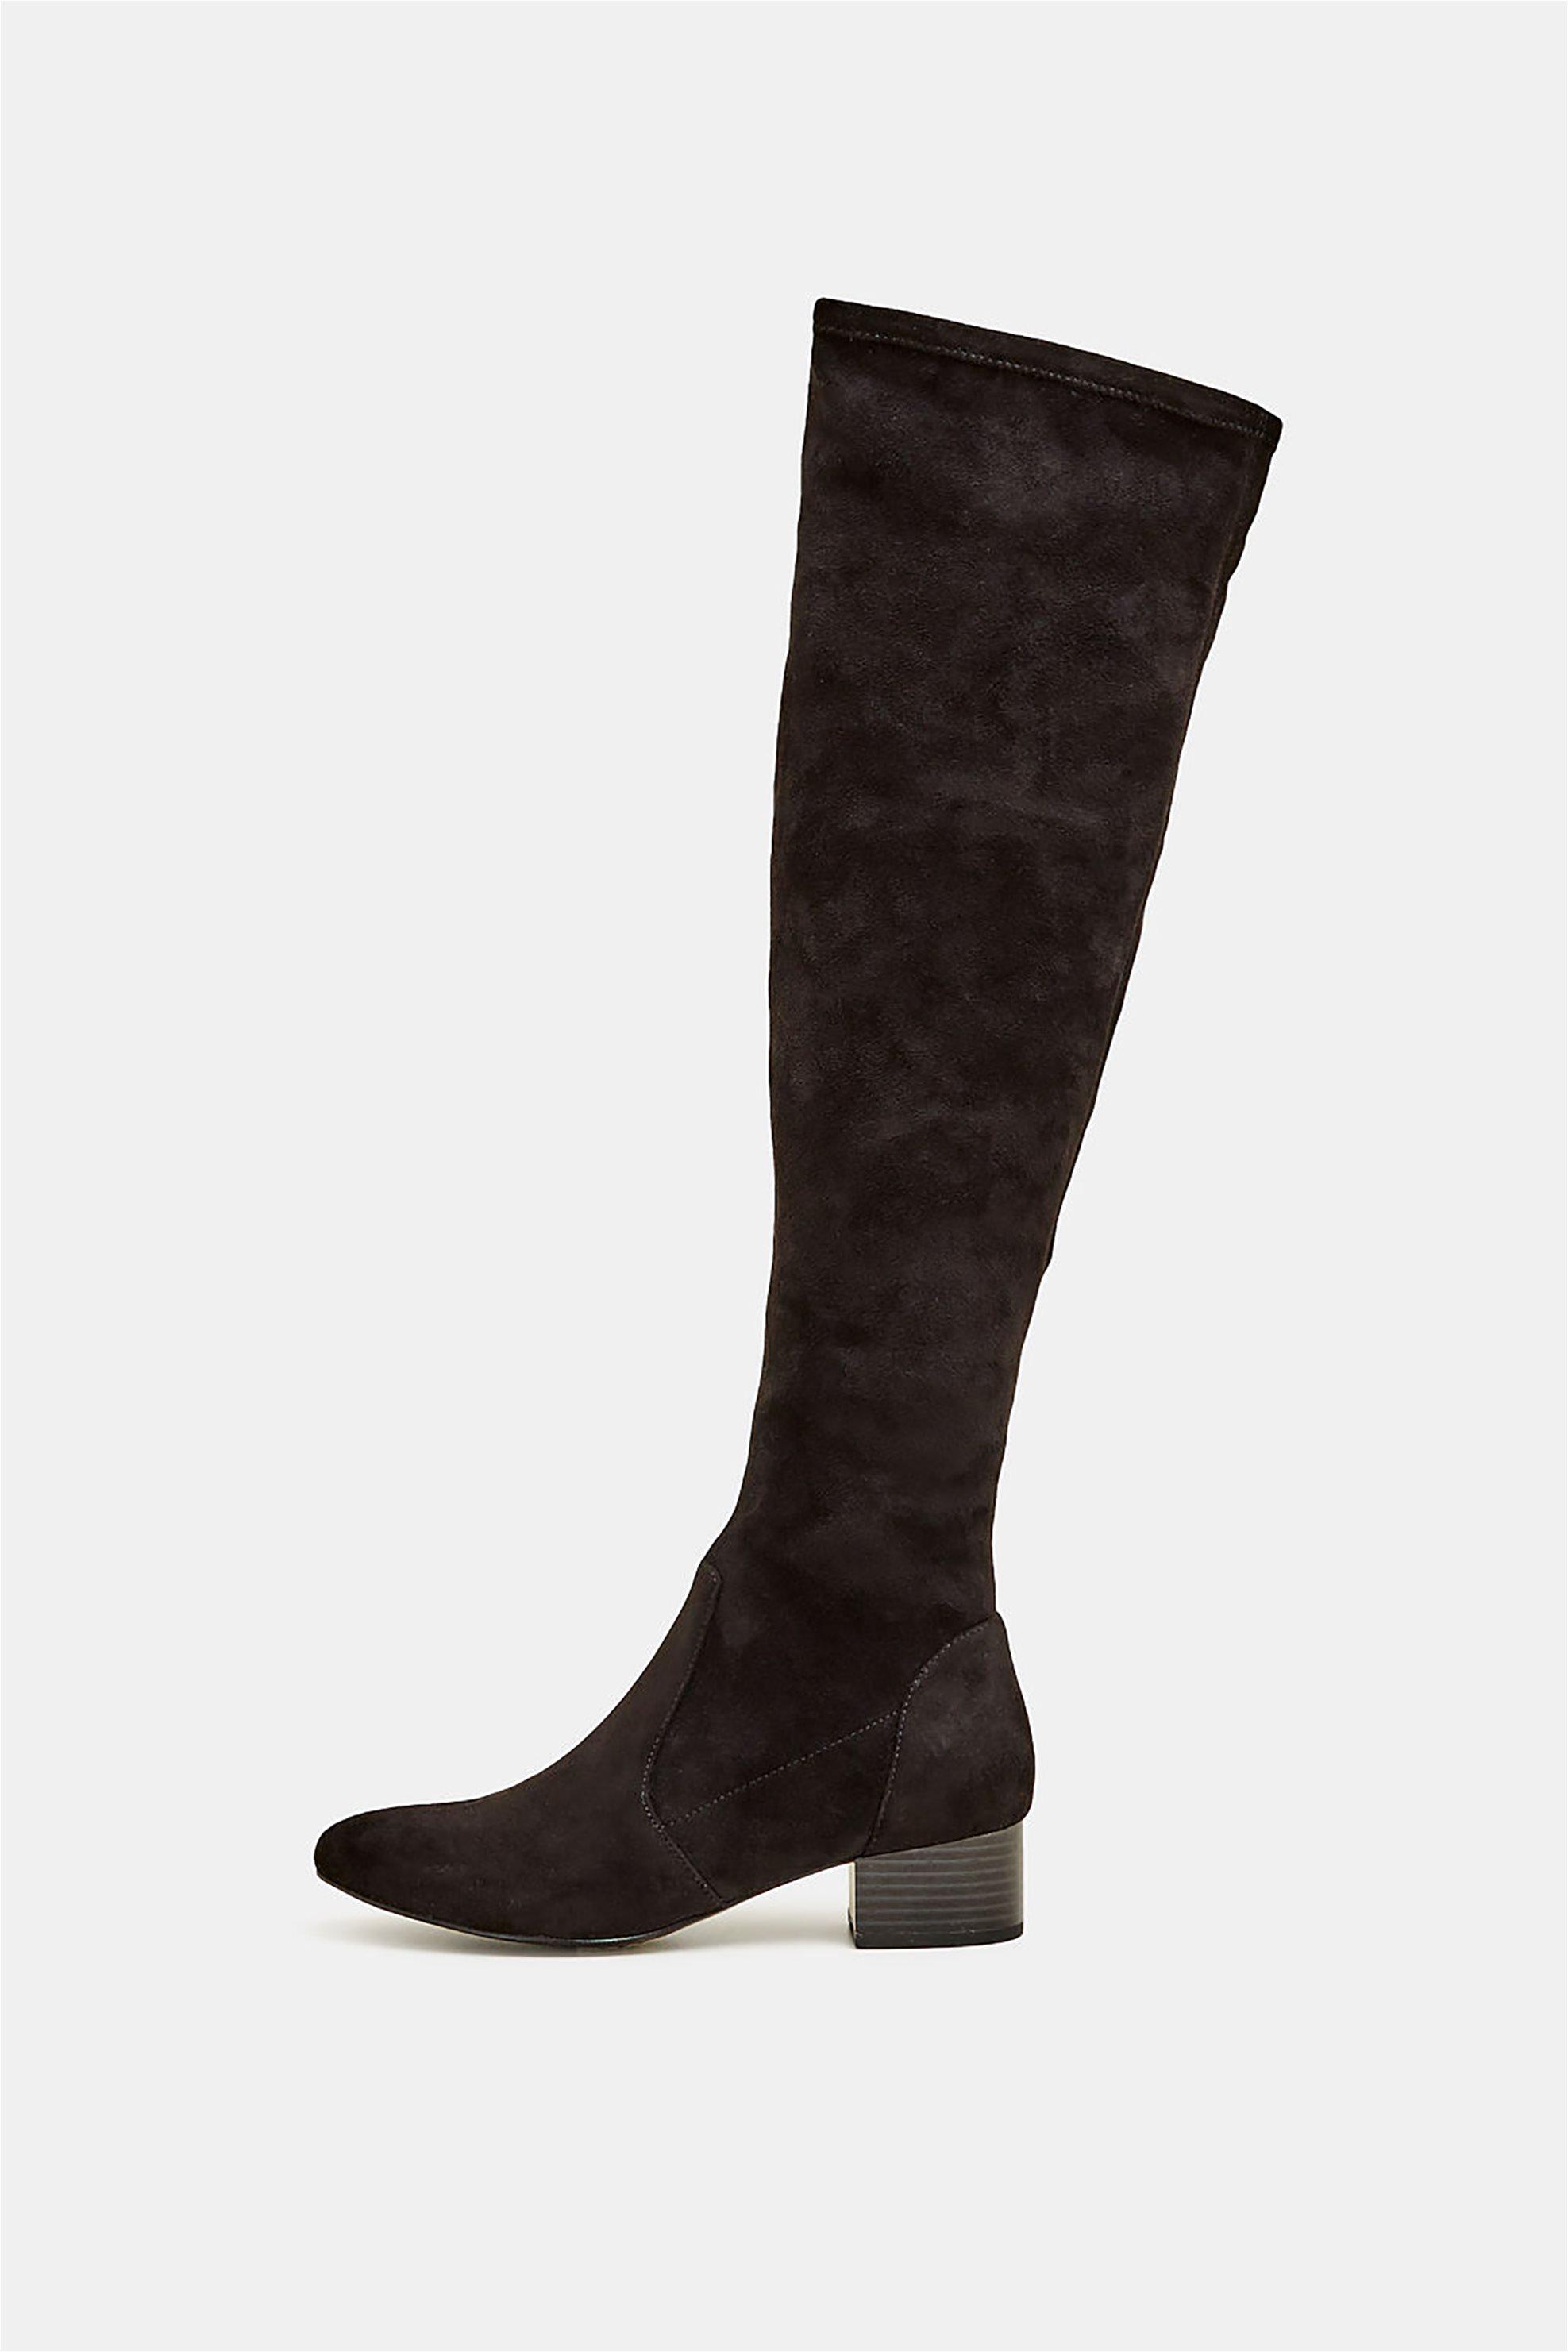 Esprit γυναικείες μπότες Over the knee – 099EK1W016 – Μαύρο